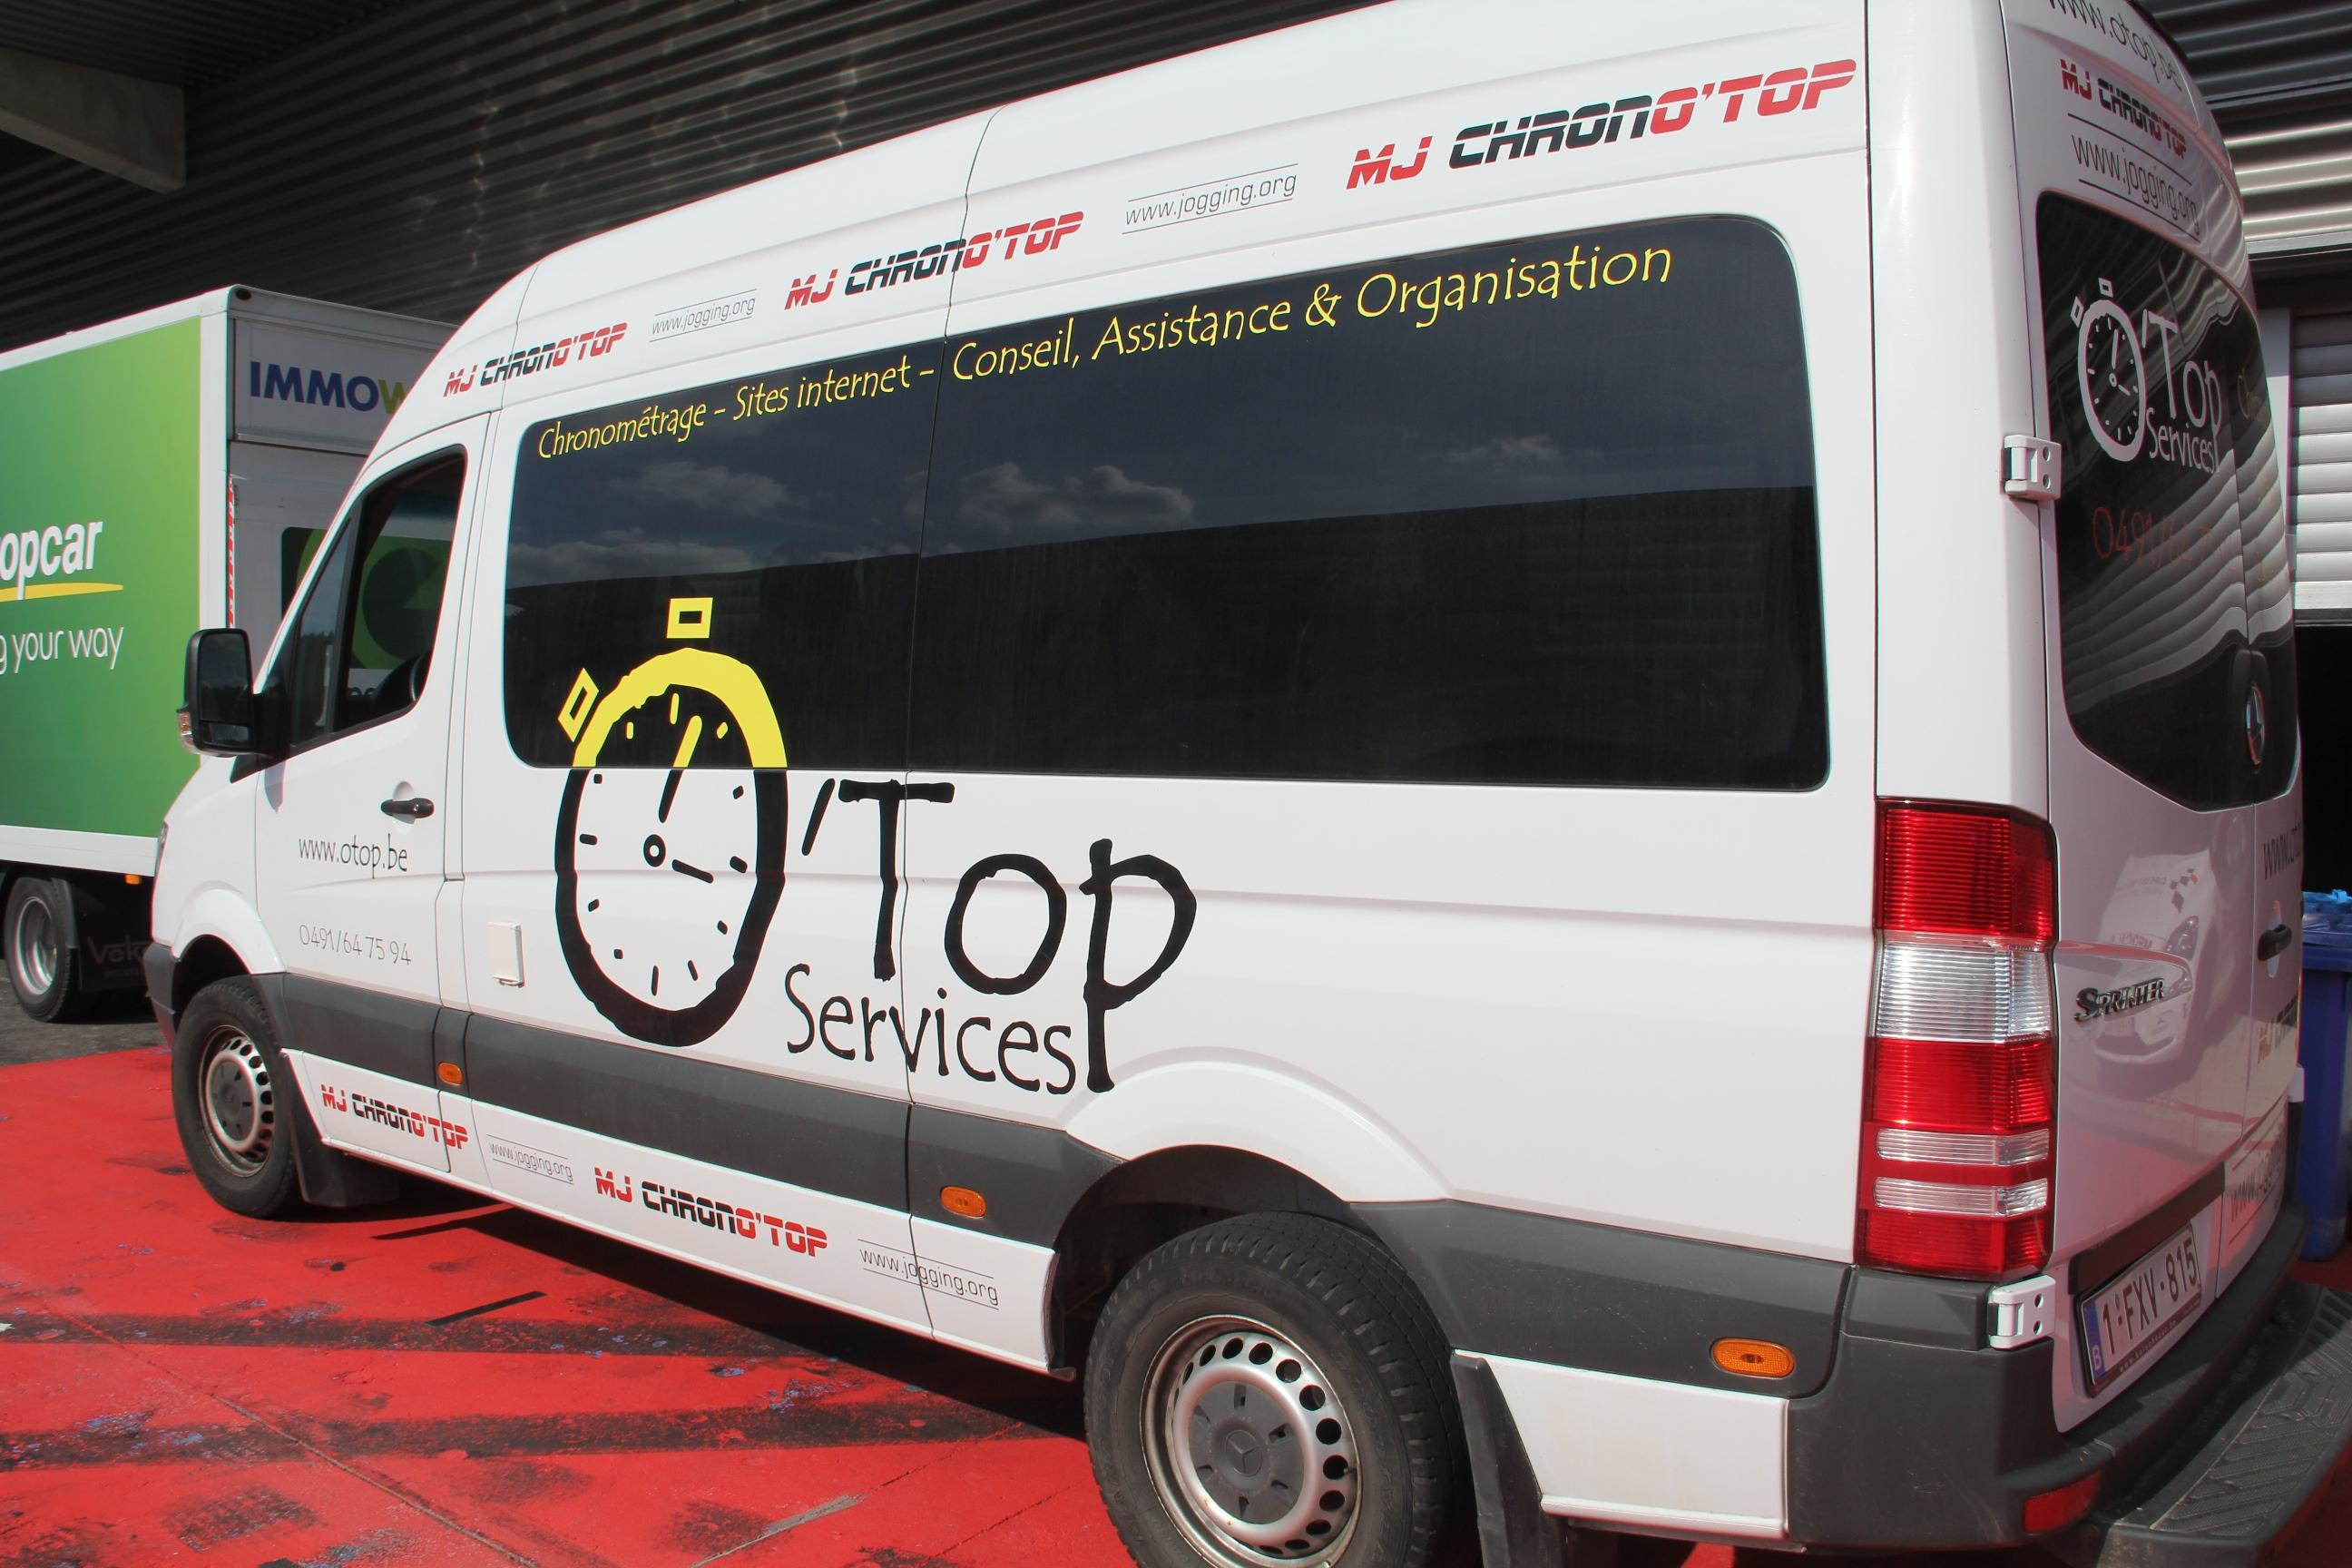 Otopcar3